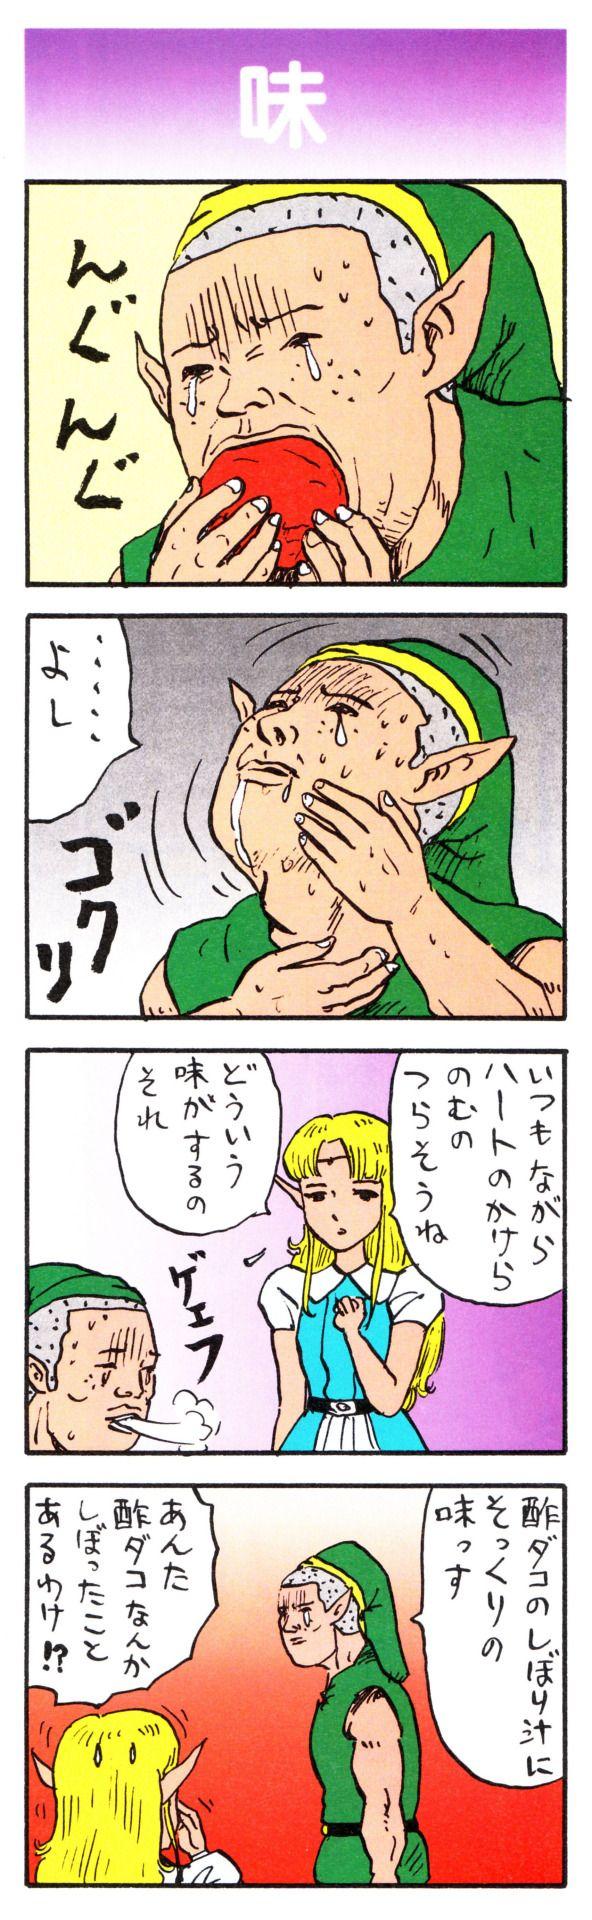 dagger-of-thieves:   吉田戦車はまり道 味 ファミ通コミック No.2 1992年